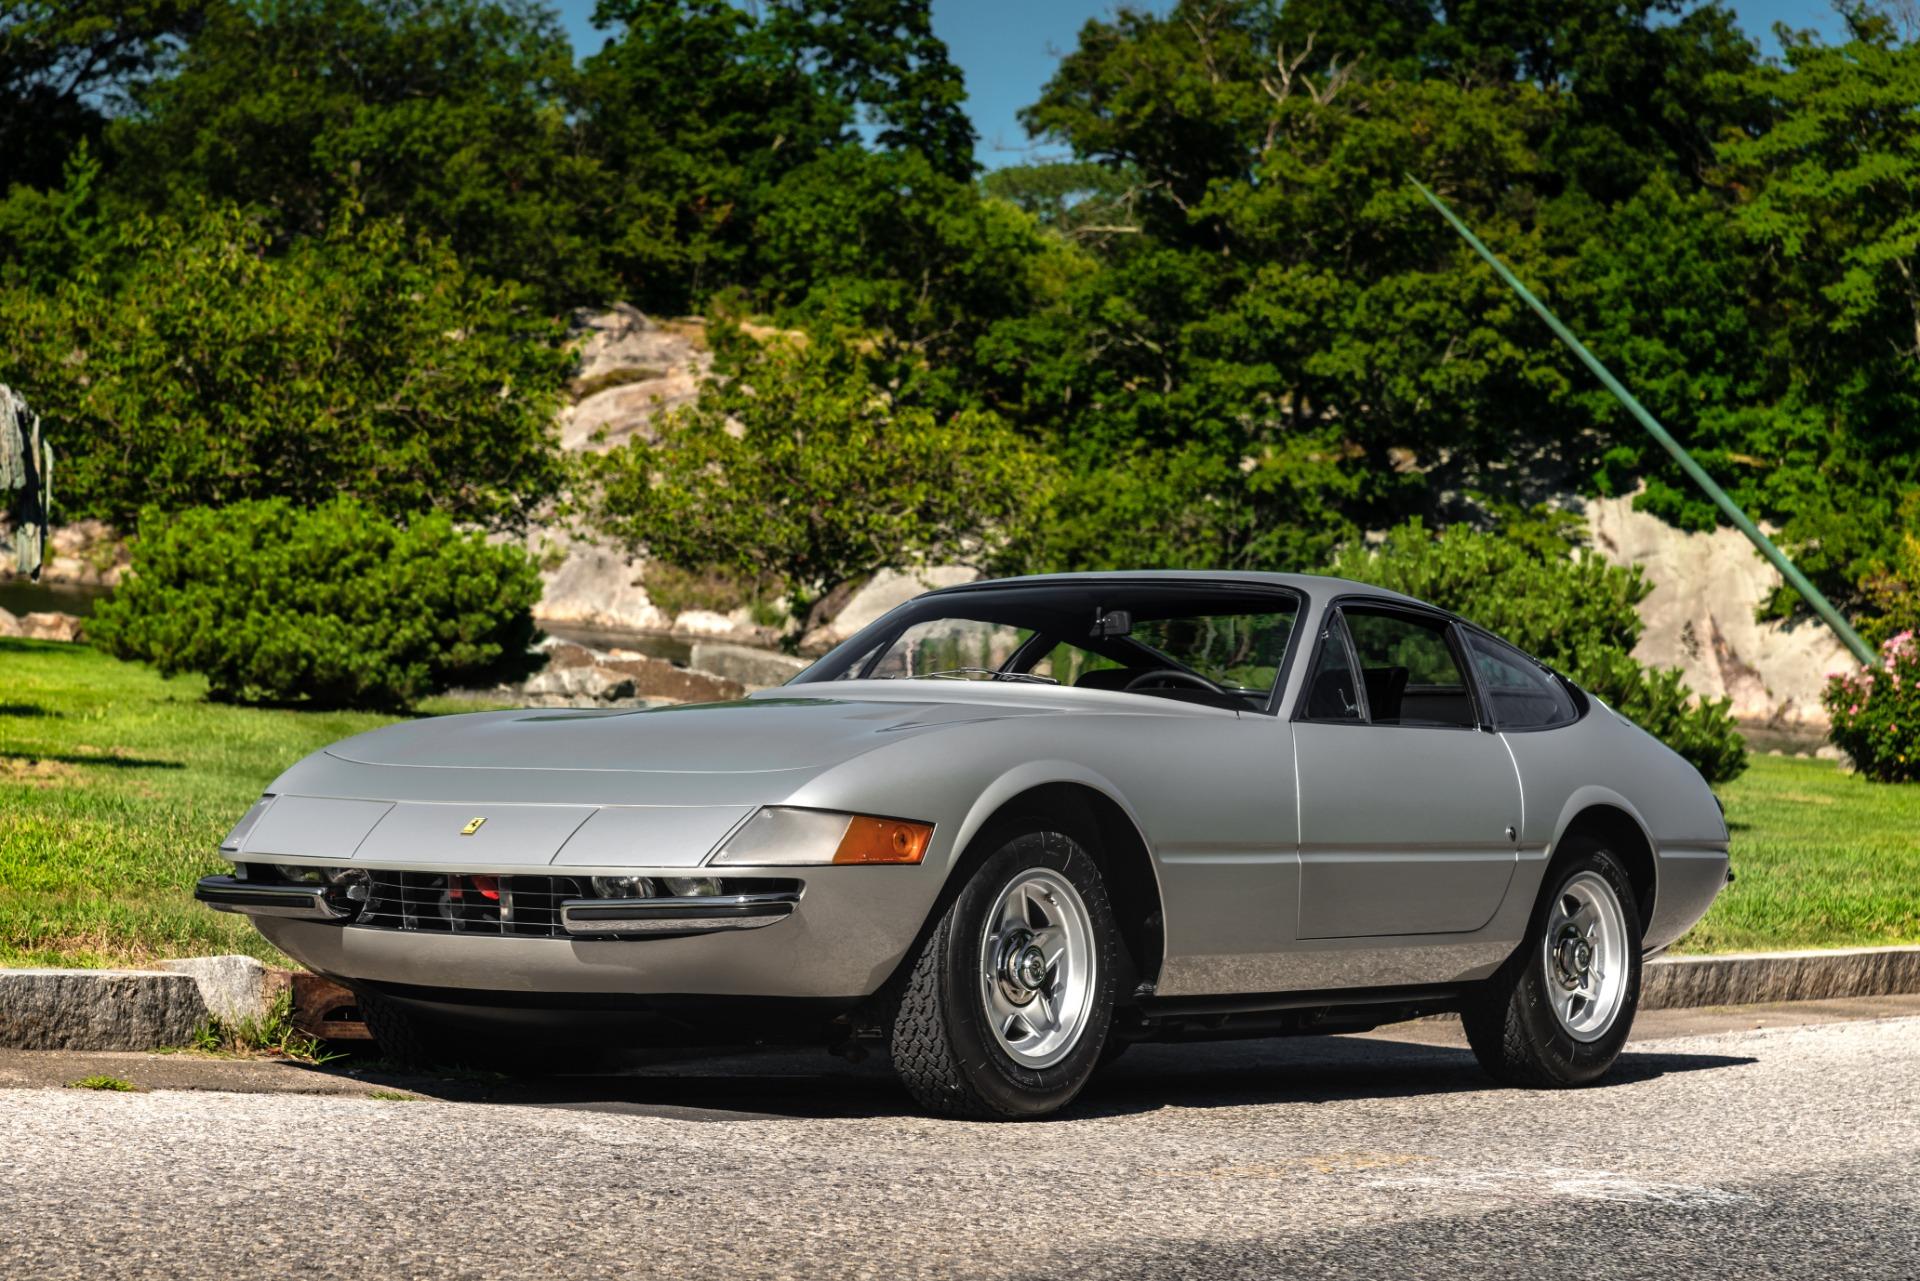 Used 1971 Ferrari 365 GTB/4 Daytona for sale Sold at Aston Martin of Greenwich in Greenwich CT 06830 1